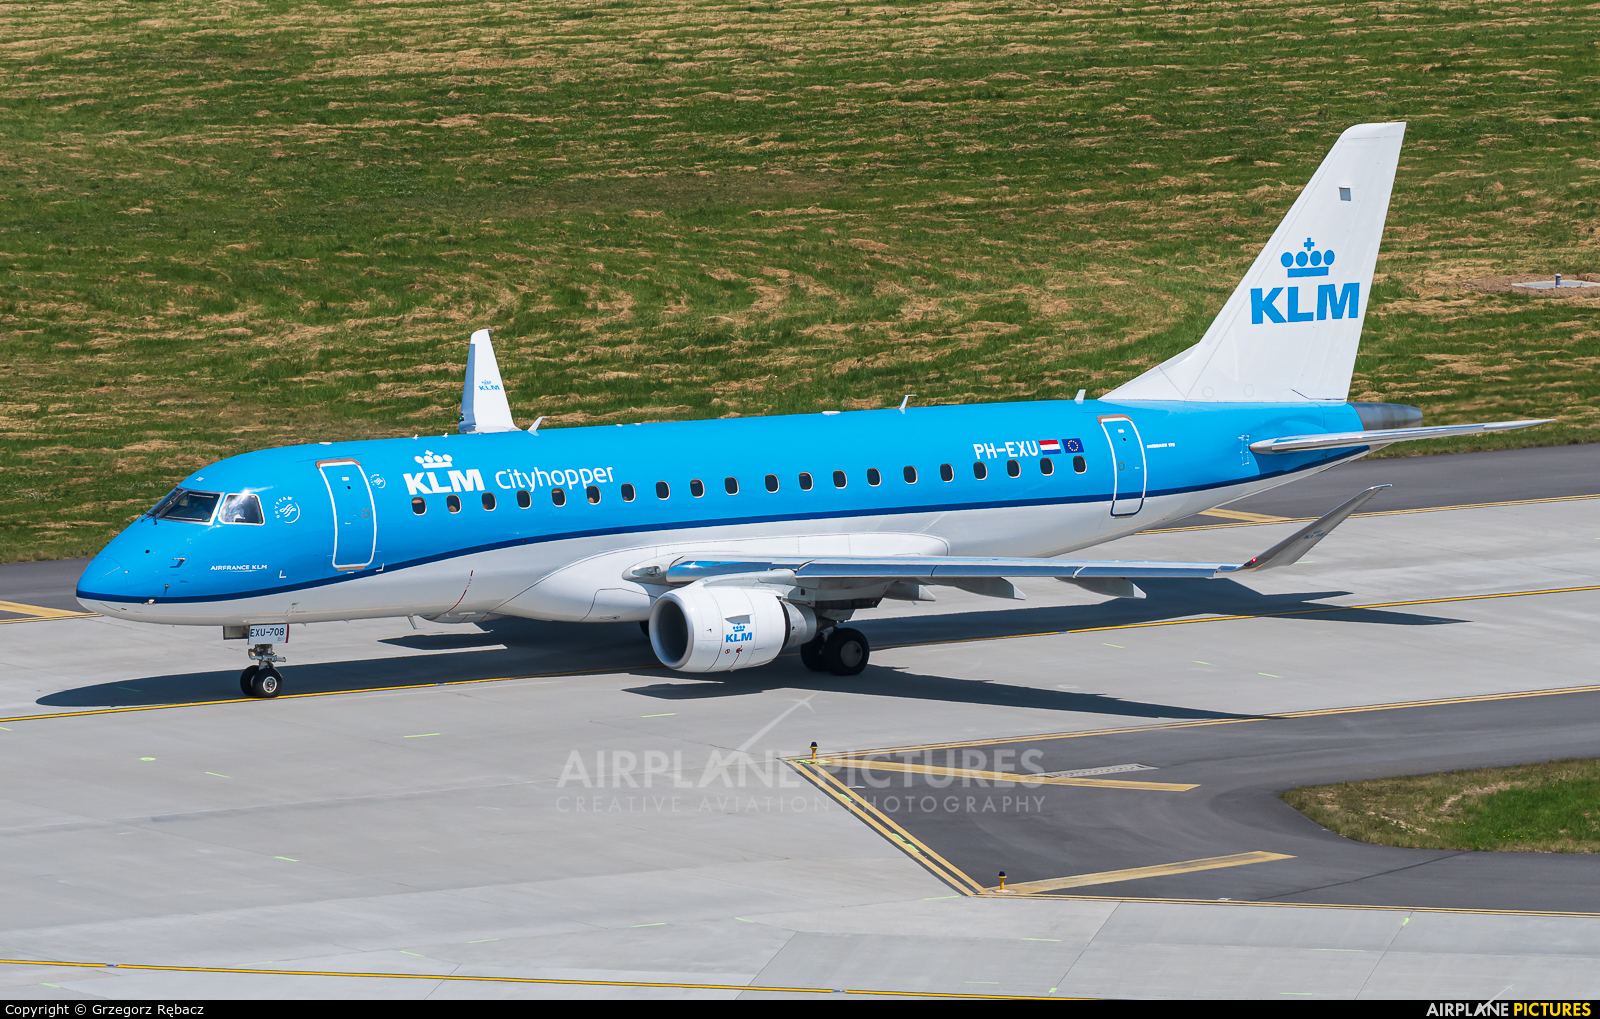 KLM Cityhopper PH-EXU aircraft at Kraków - John Paul II Intl